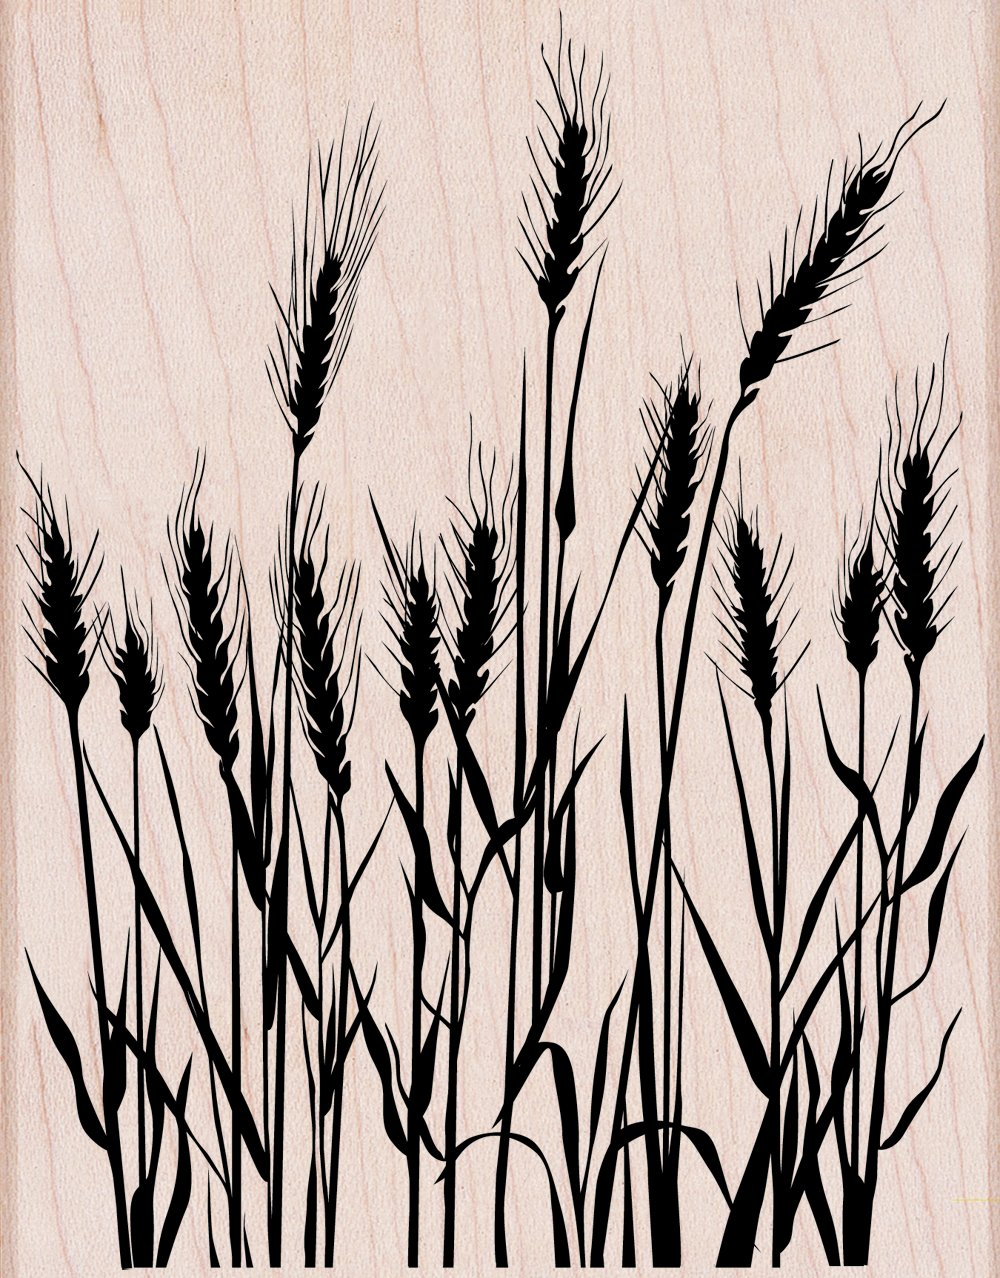 Hero Arts Woodblock Stamp Silhouette Grass Inc. S5316